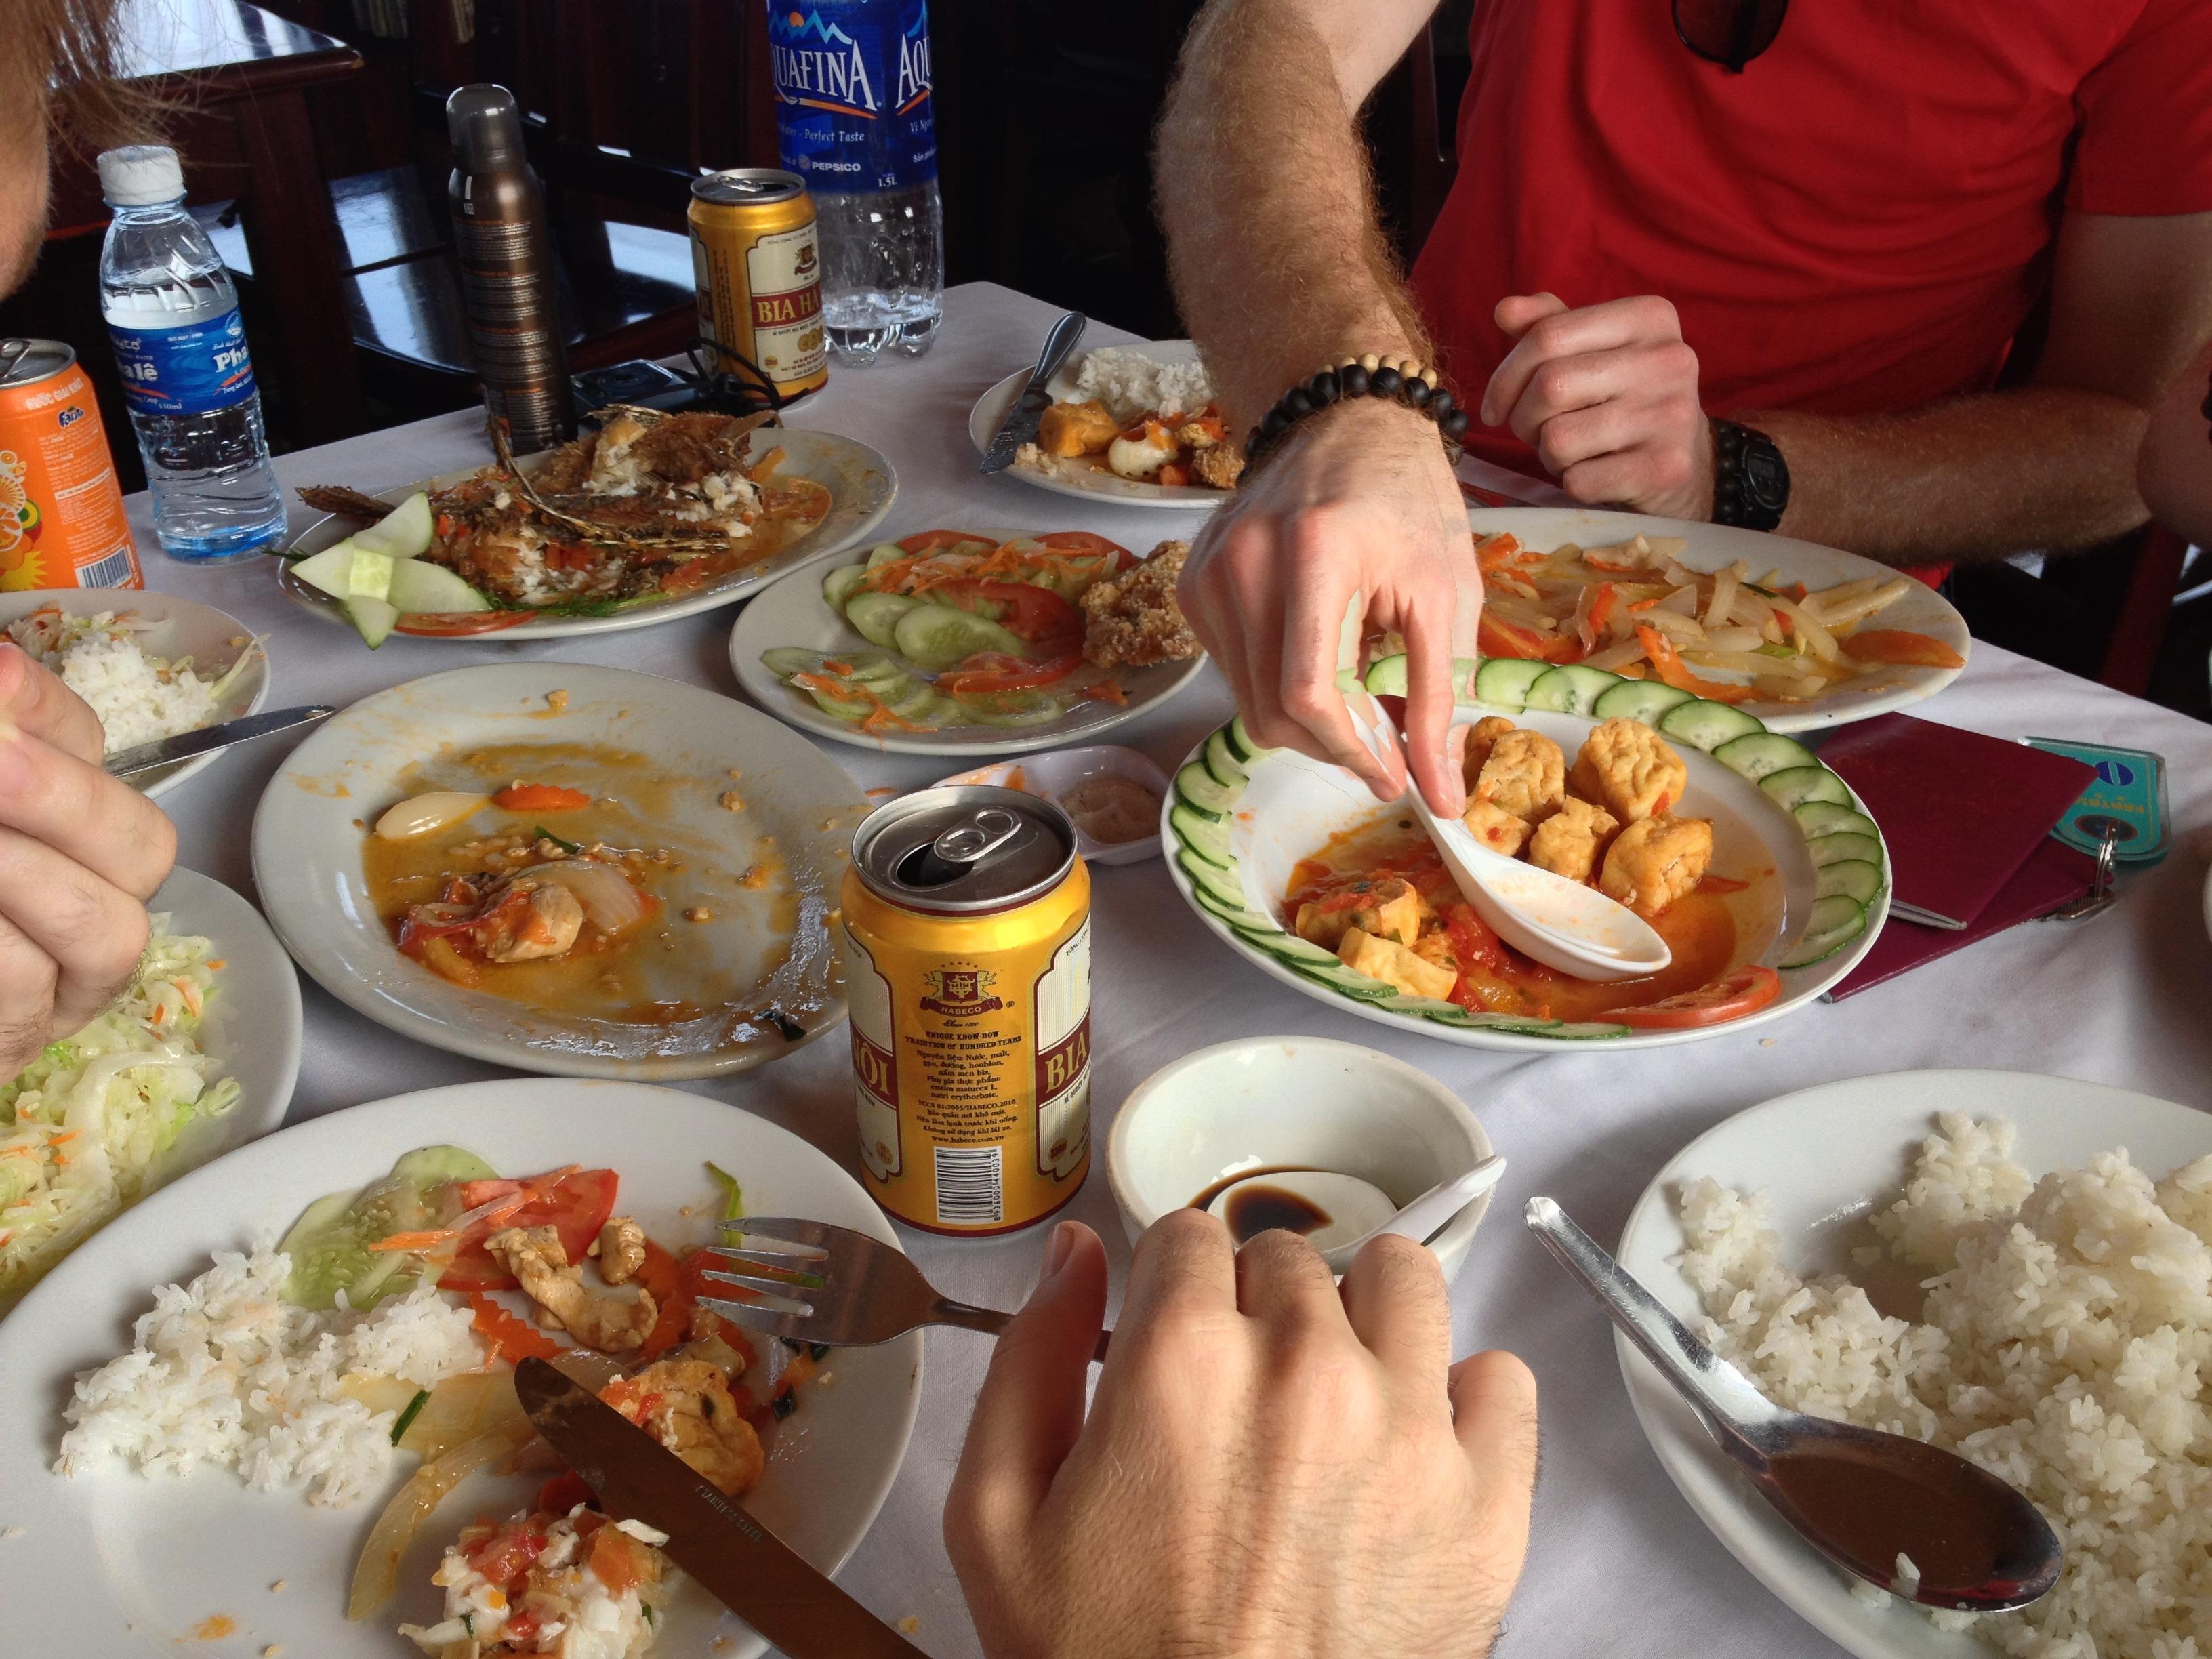 Fotos Gratis Mesa Grupo Gente Restaurante Asi Tico